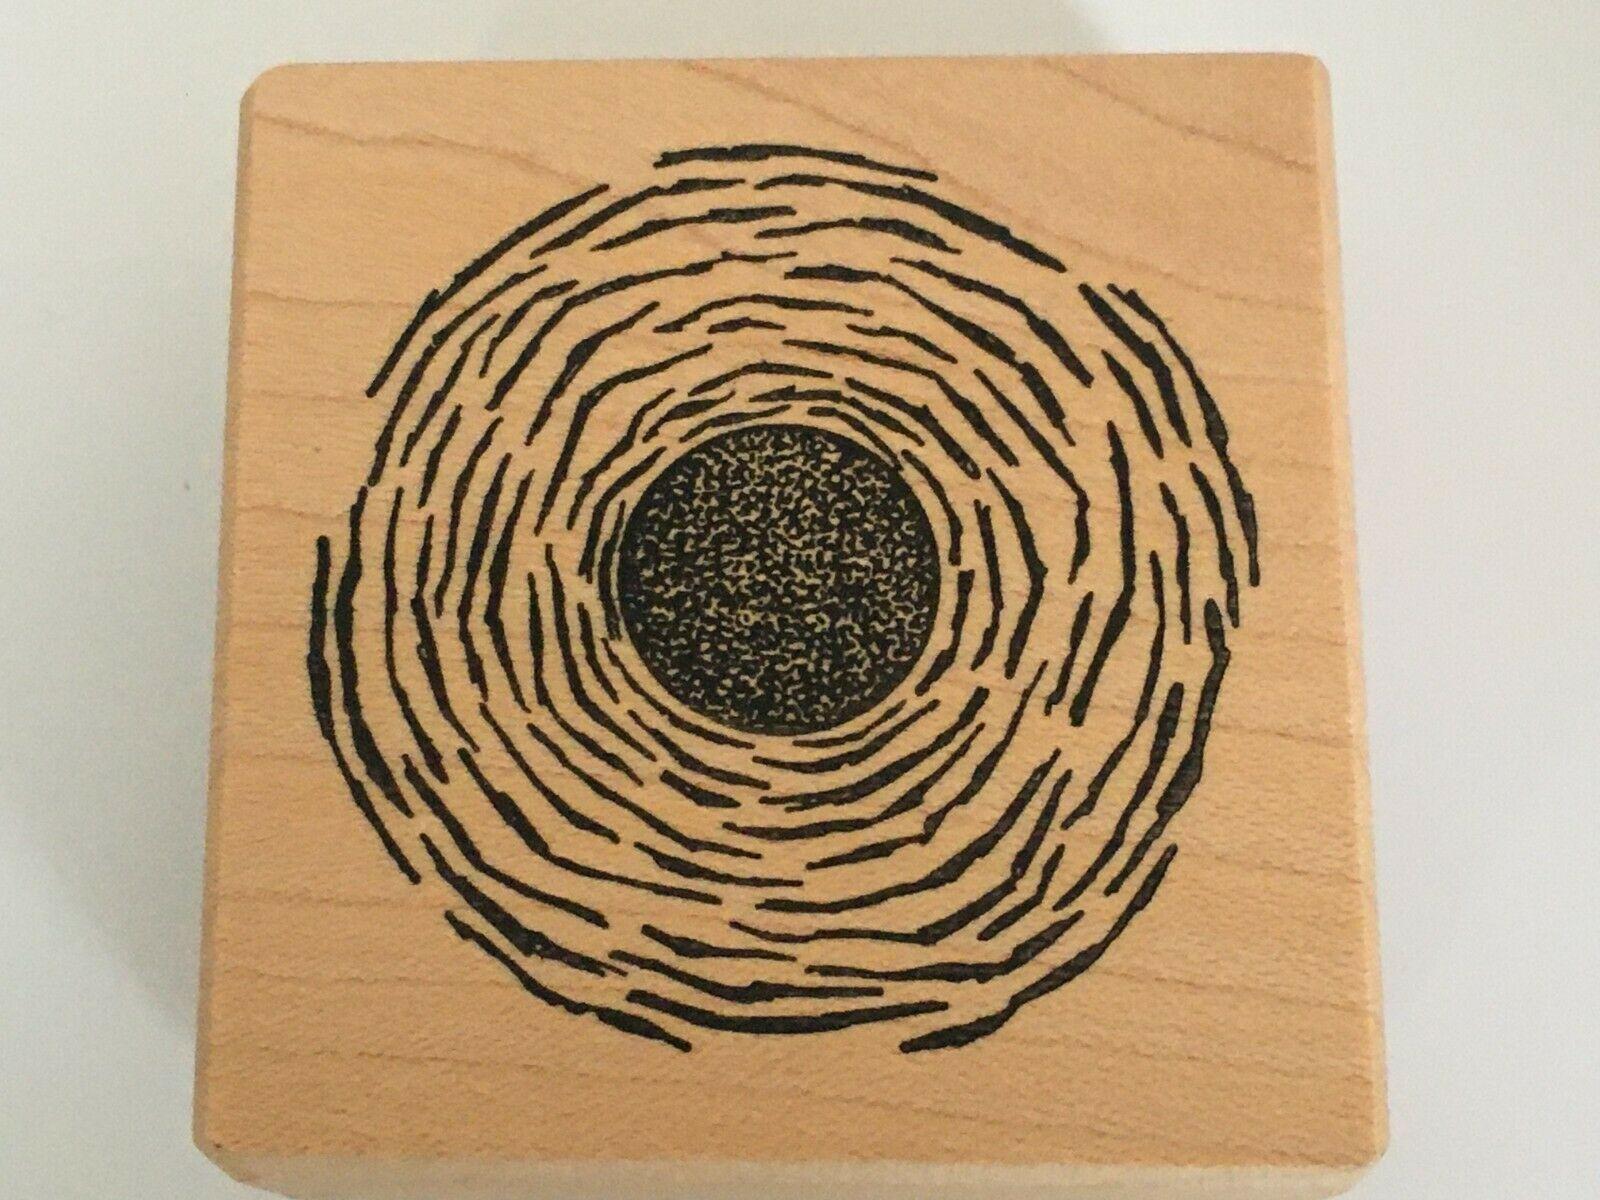 Stampa Barbara Stamp Psychadelic Labyrinth Abstract Circle Maze Tree Rings - $4.50